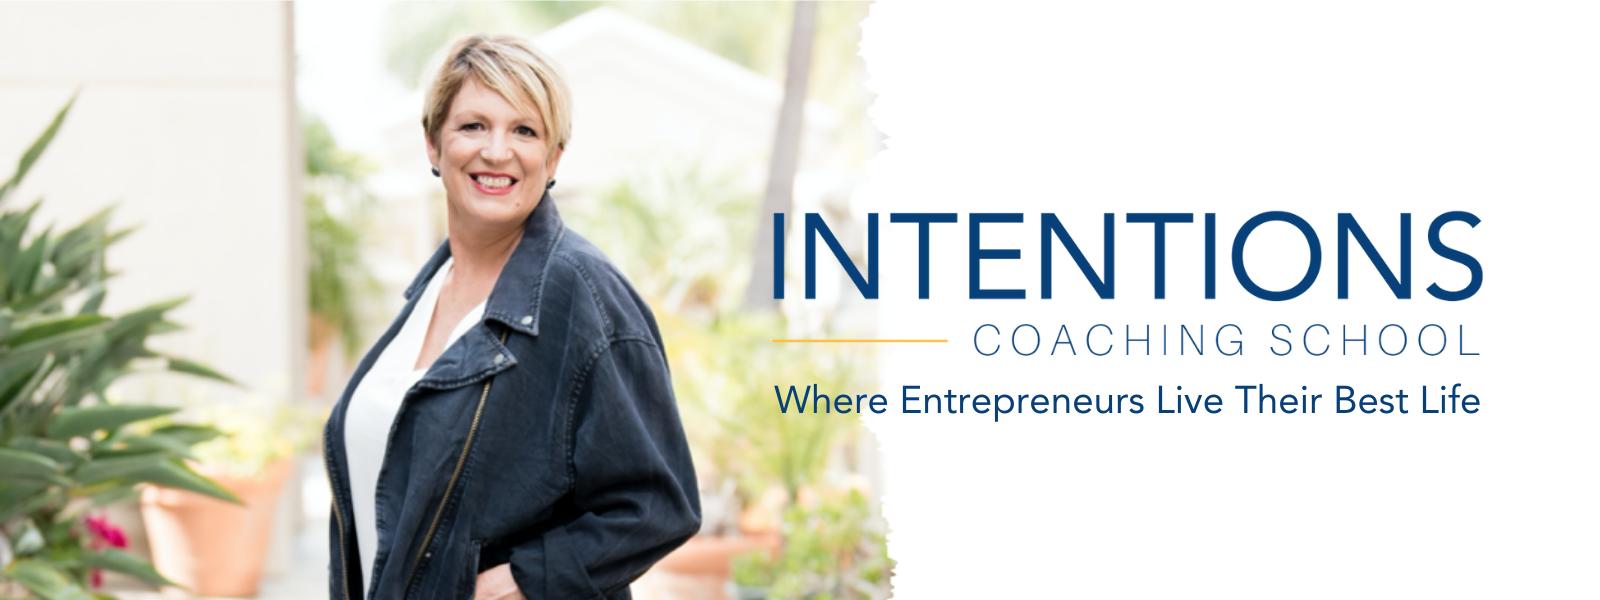 INTENTIONS Coaching School - Patti Keating